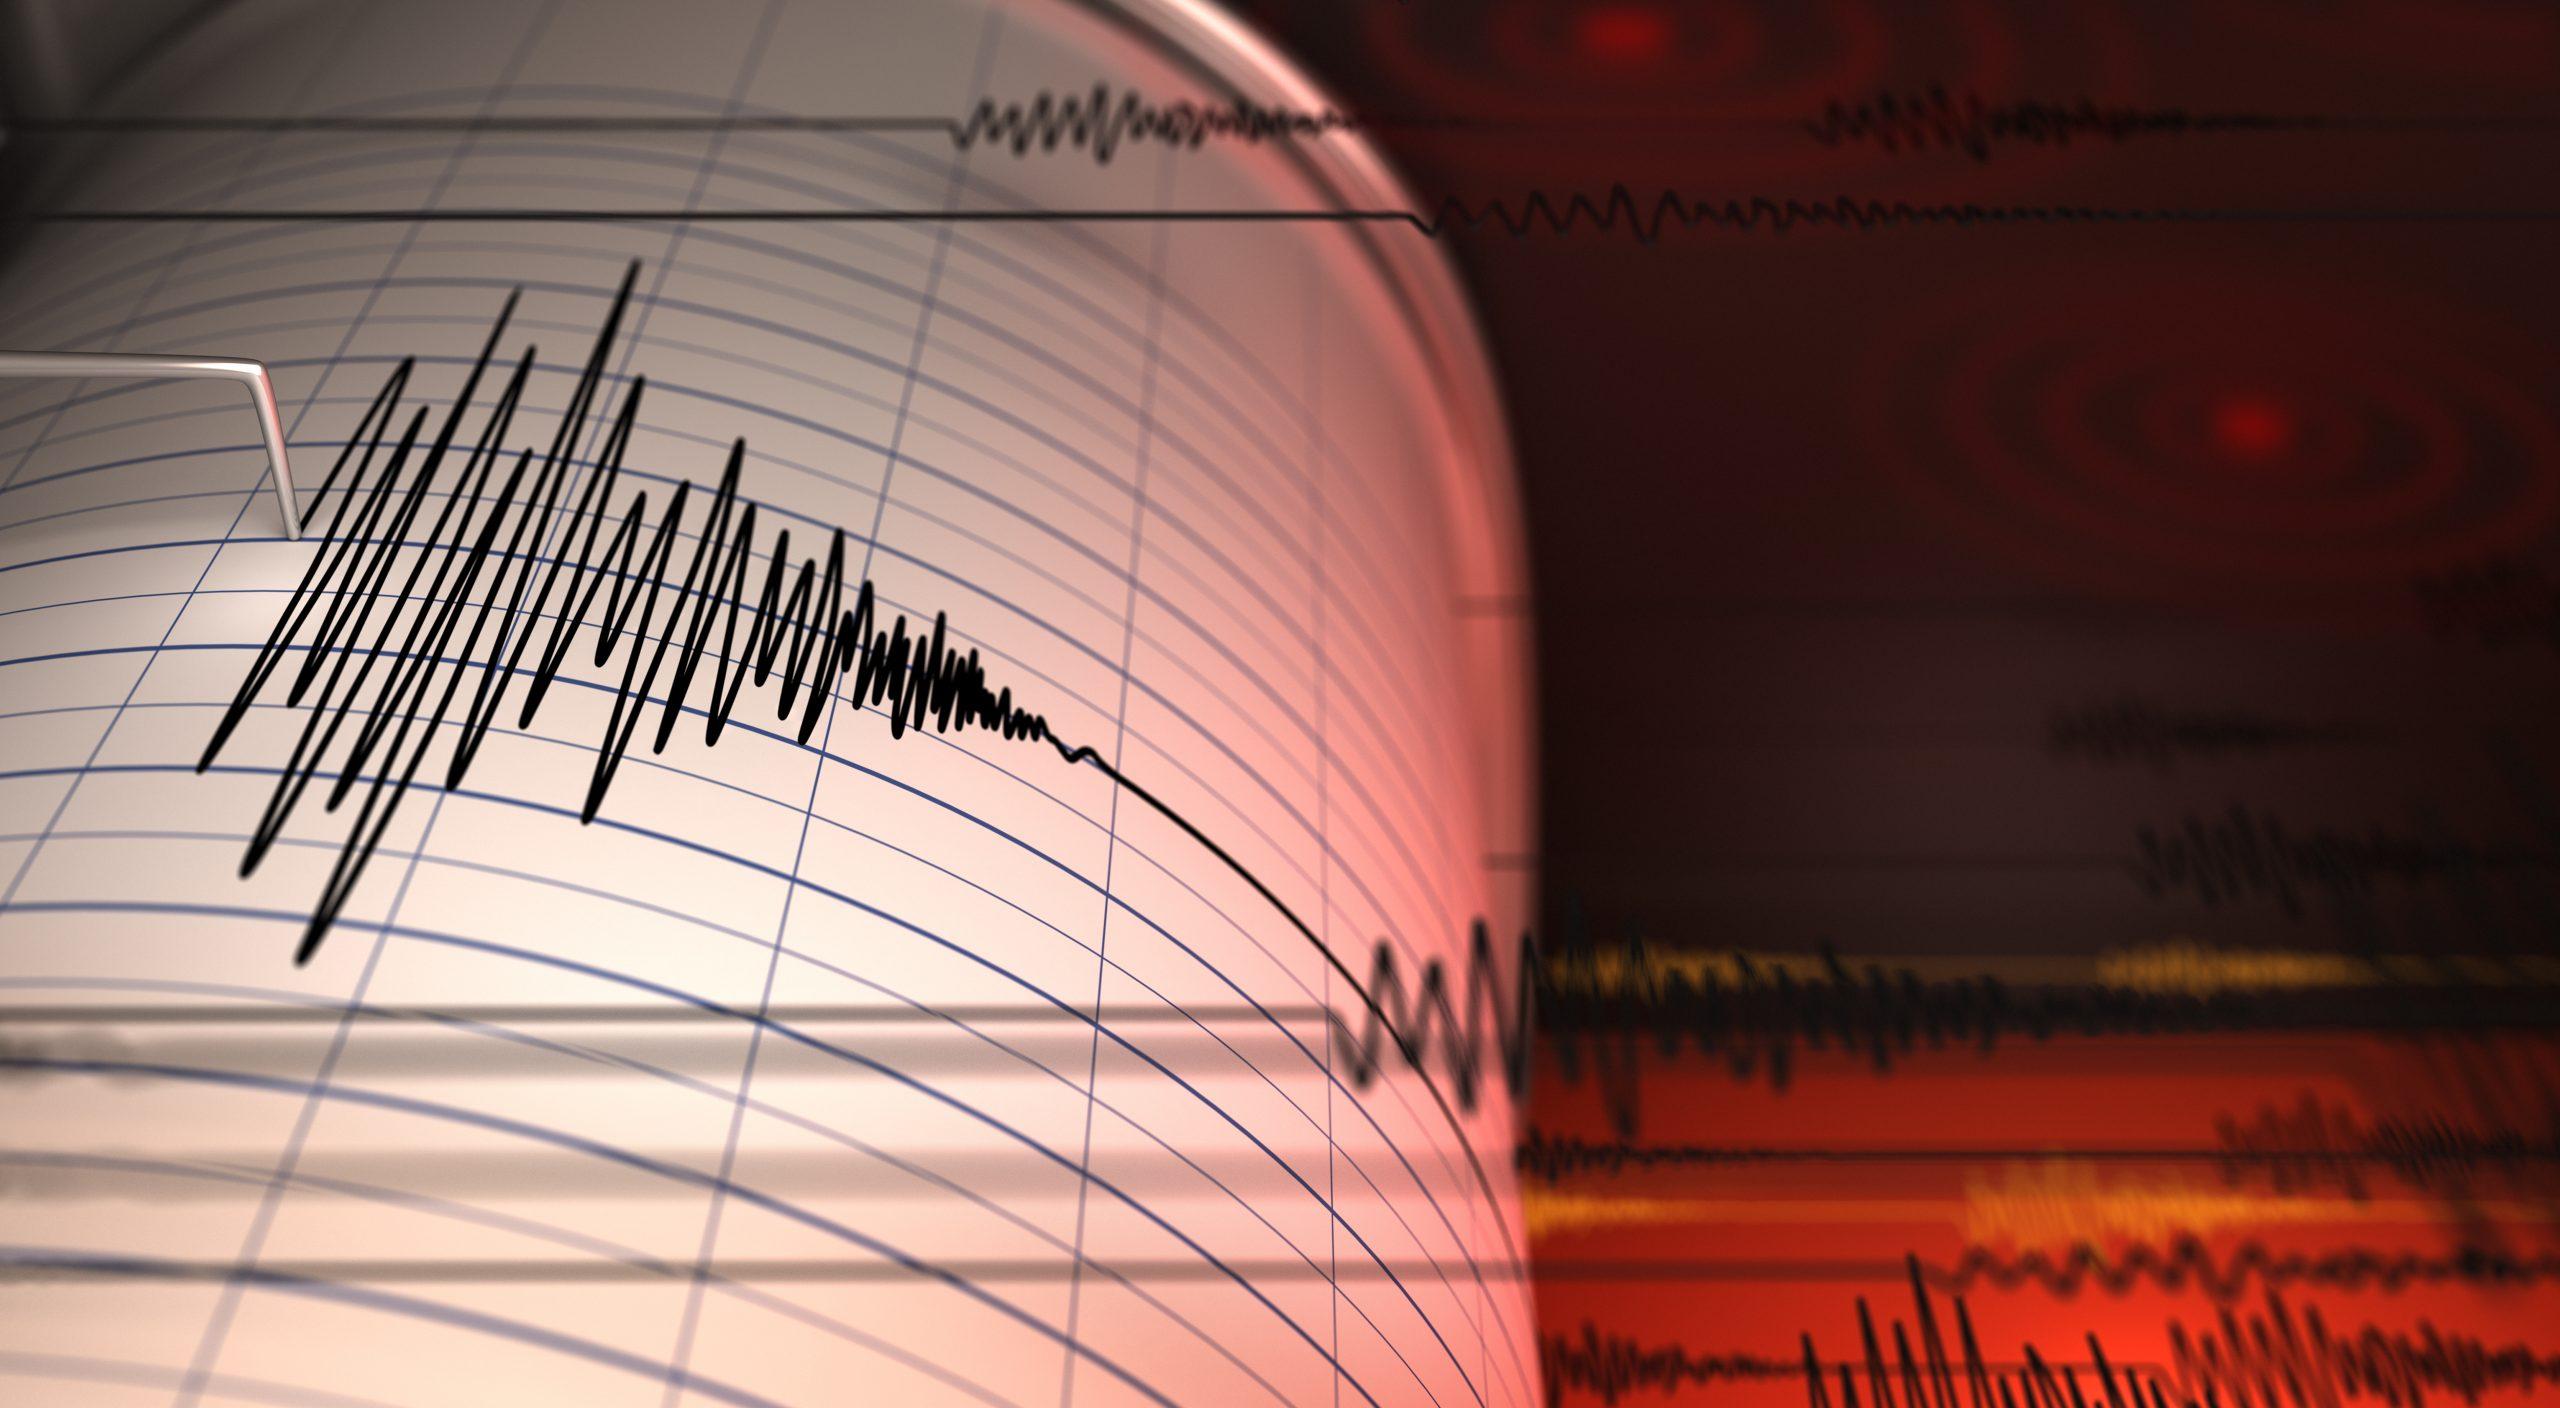 shutterstock 756769723 scaled - Earthquake Sparks Emergency Water Preparedness